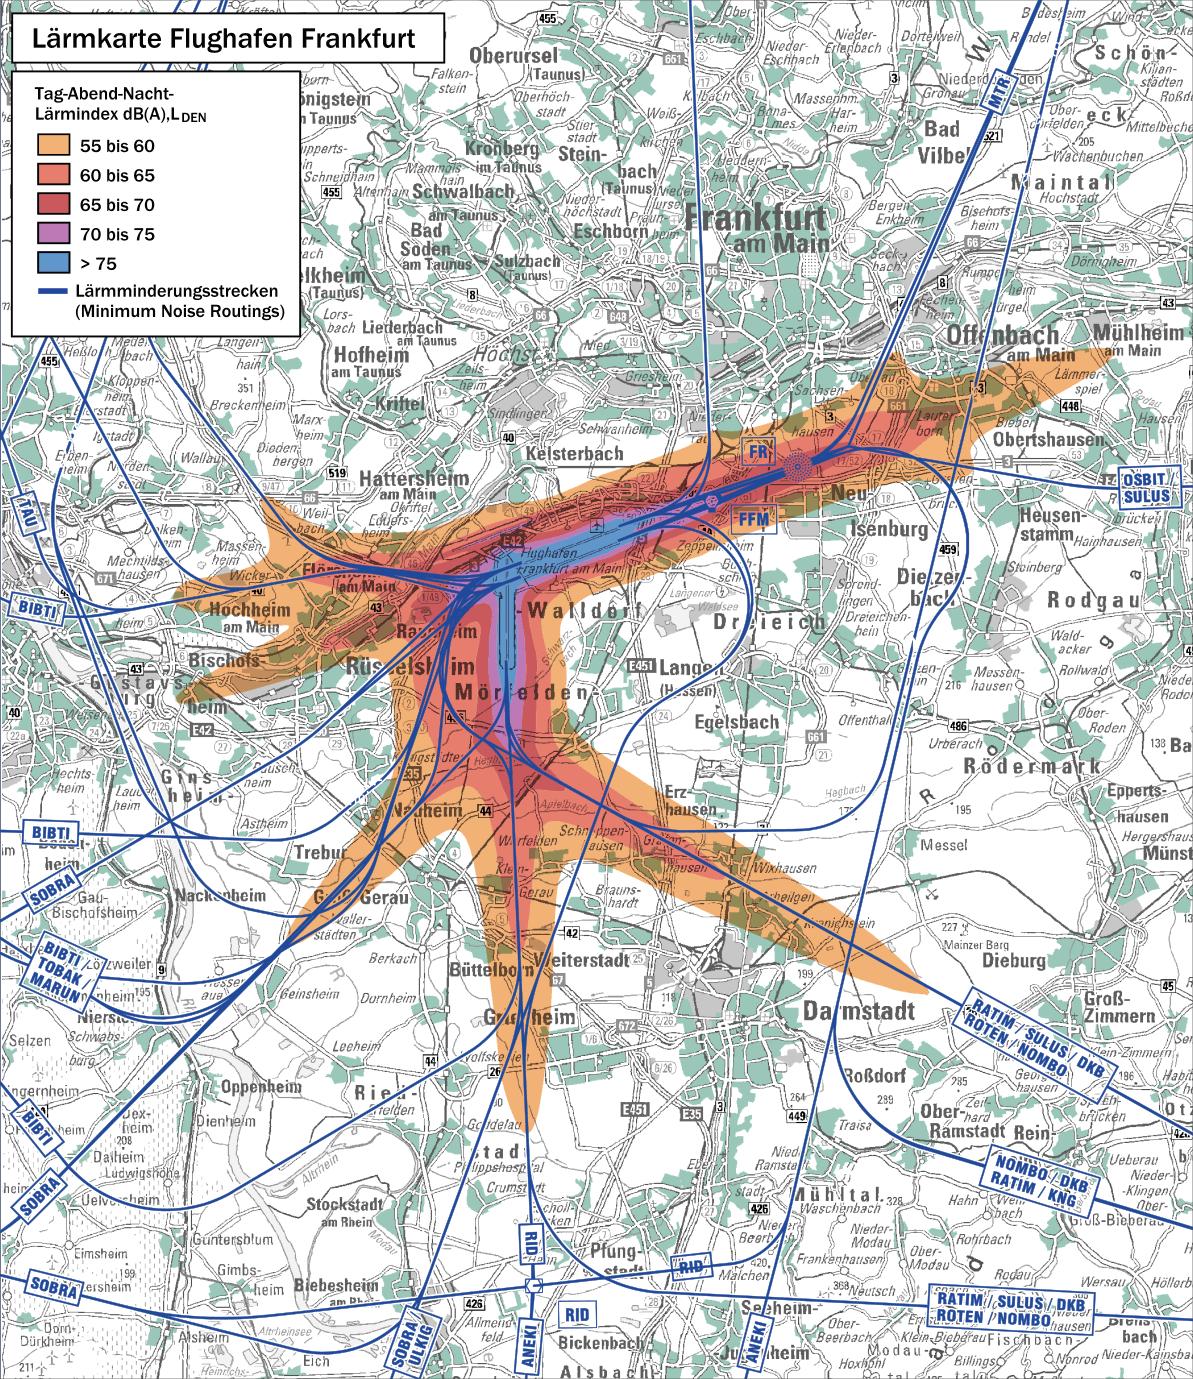 Flughafen Frankfurt am Main – Wikipedia